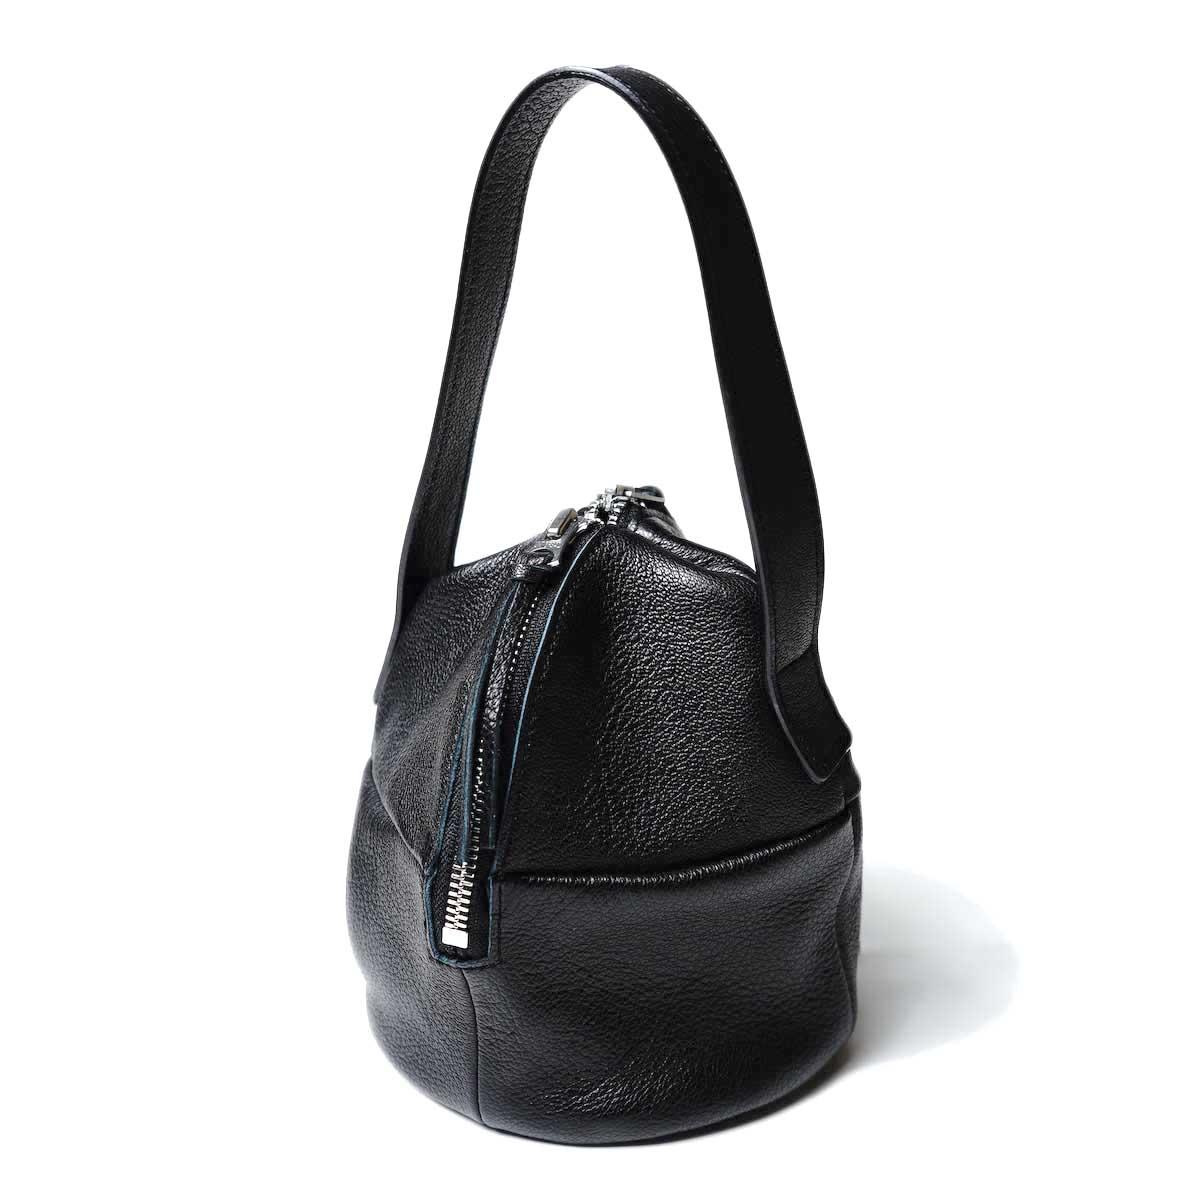 MYTHINKS / MY MINI DUFFLE BAG GOAT -Small- (Black)